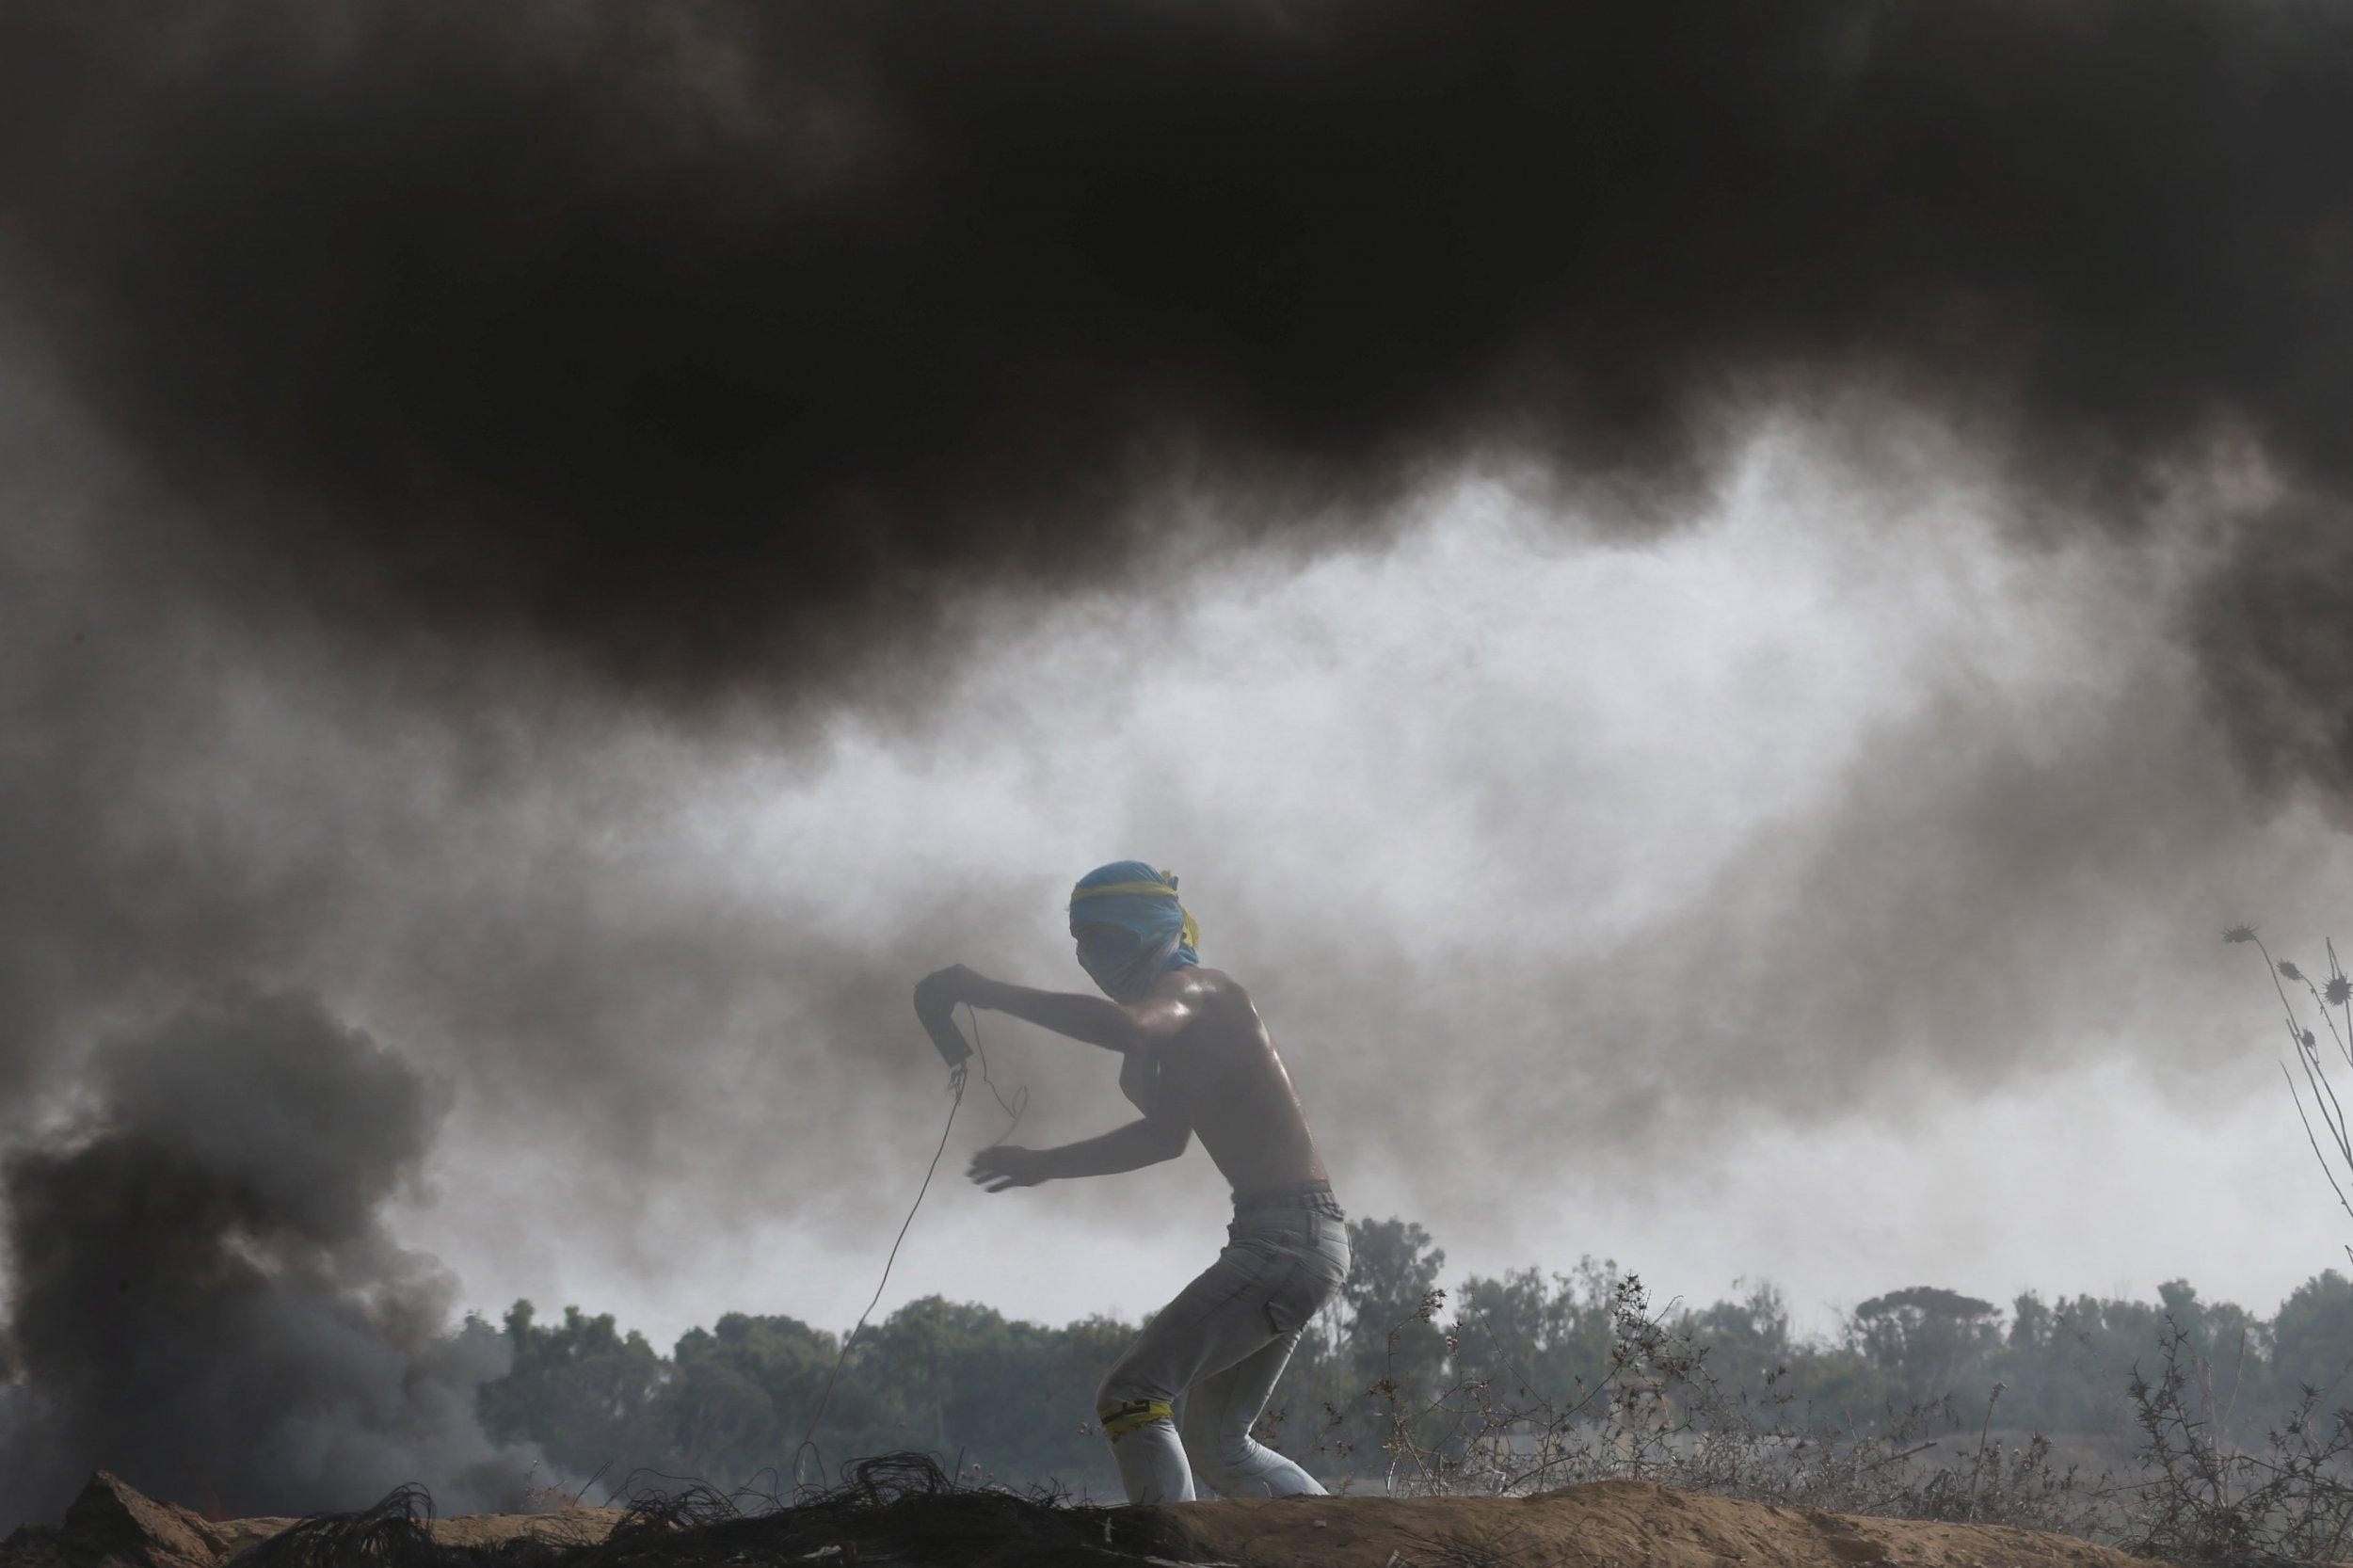 10_24_2015_palestinian